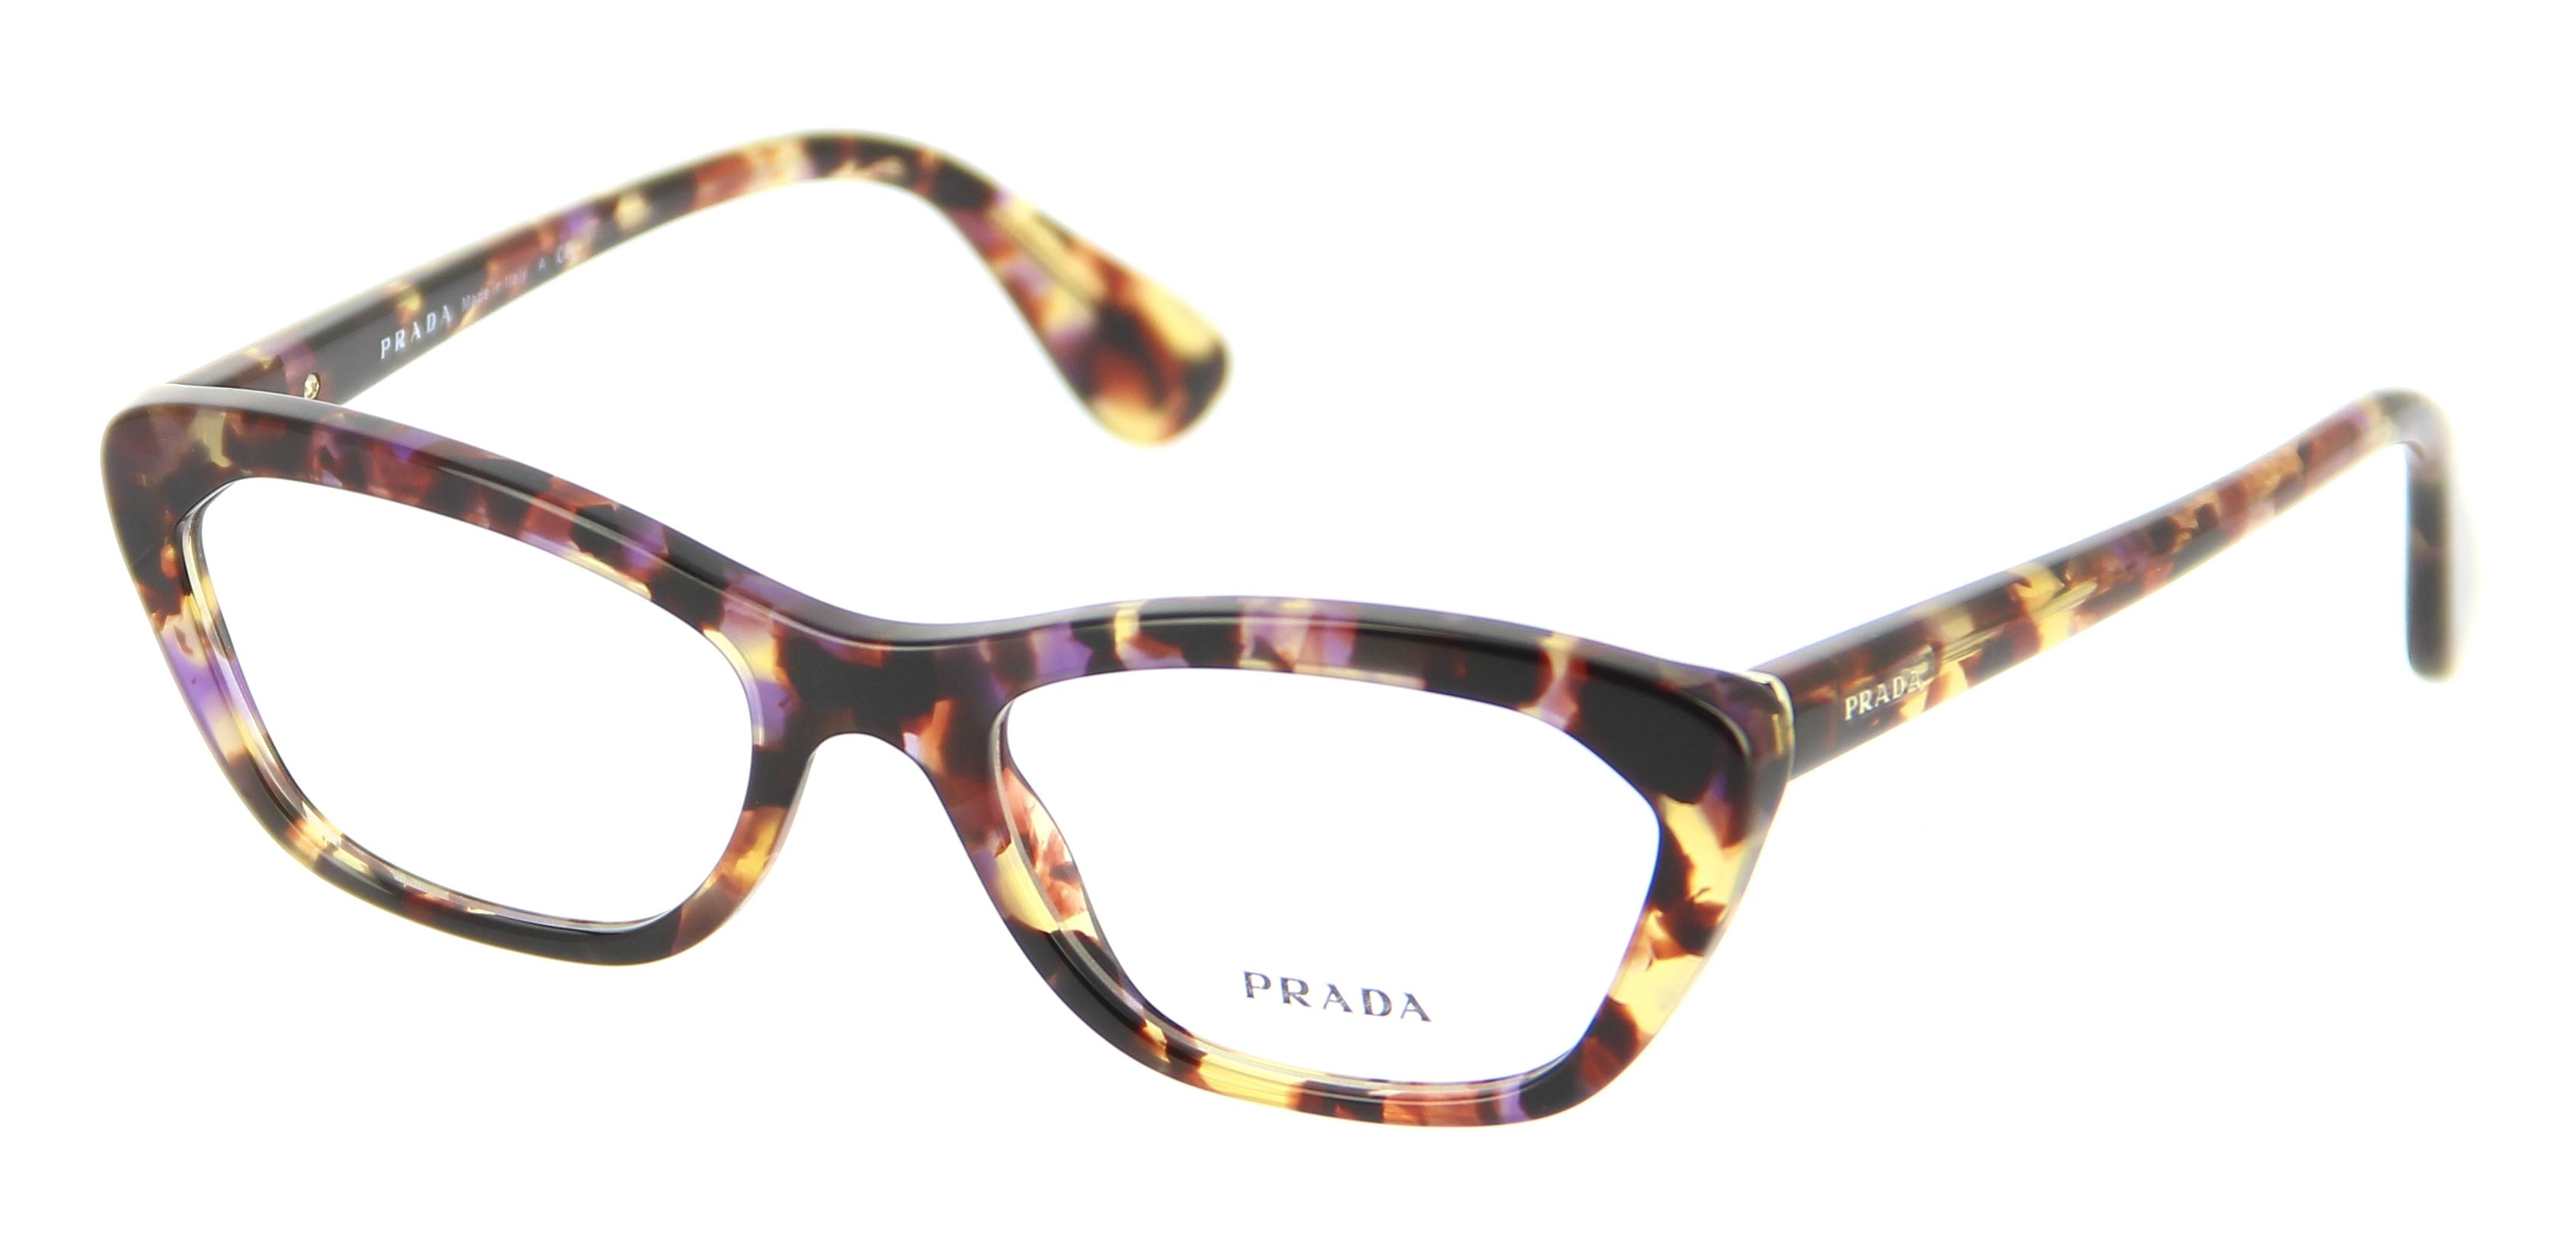 montures lunettes de vue femmes originales louisiana bucket brigade. Black Bedroom Furniture Sets. Home Design Ideas